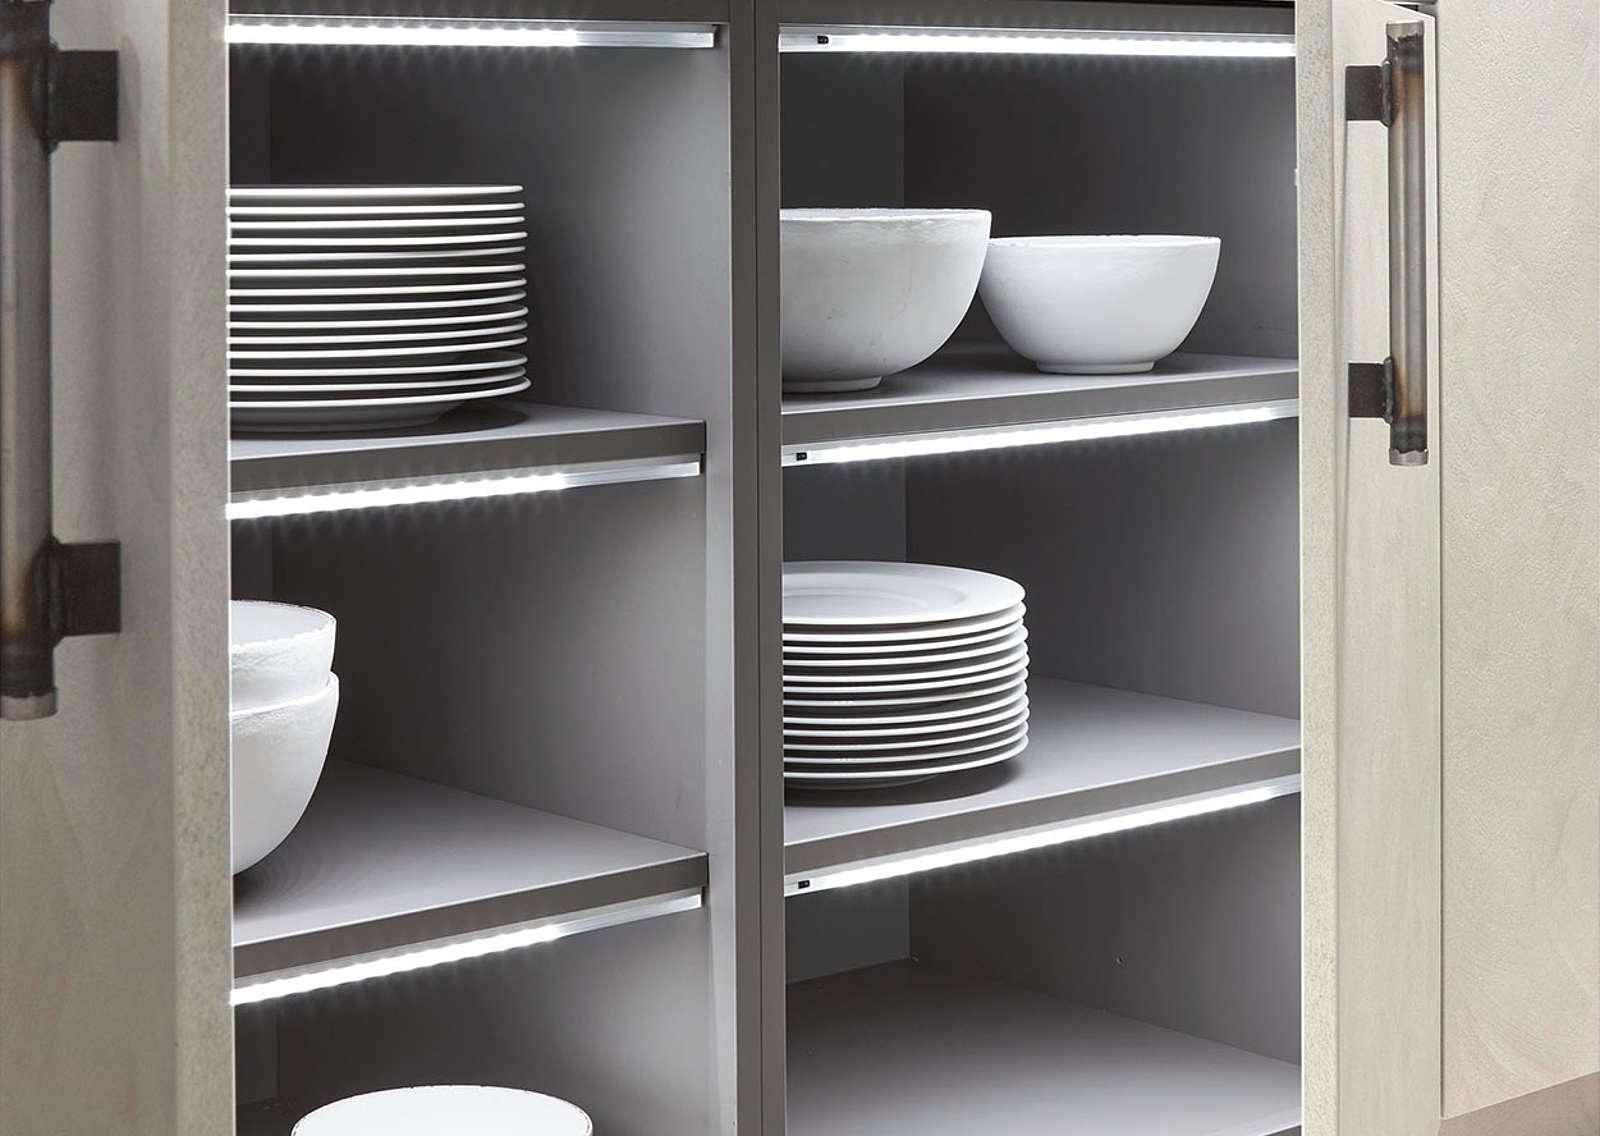 European German Italian kitchens in Toronto. Kitchen interior organization